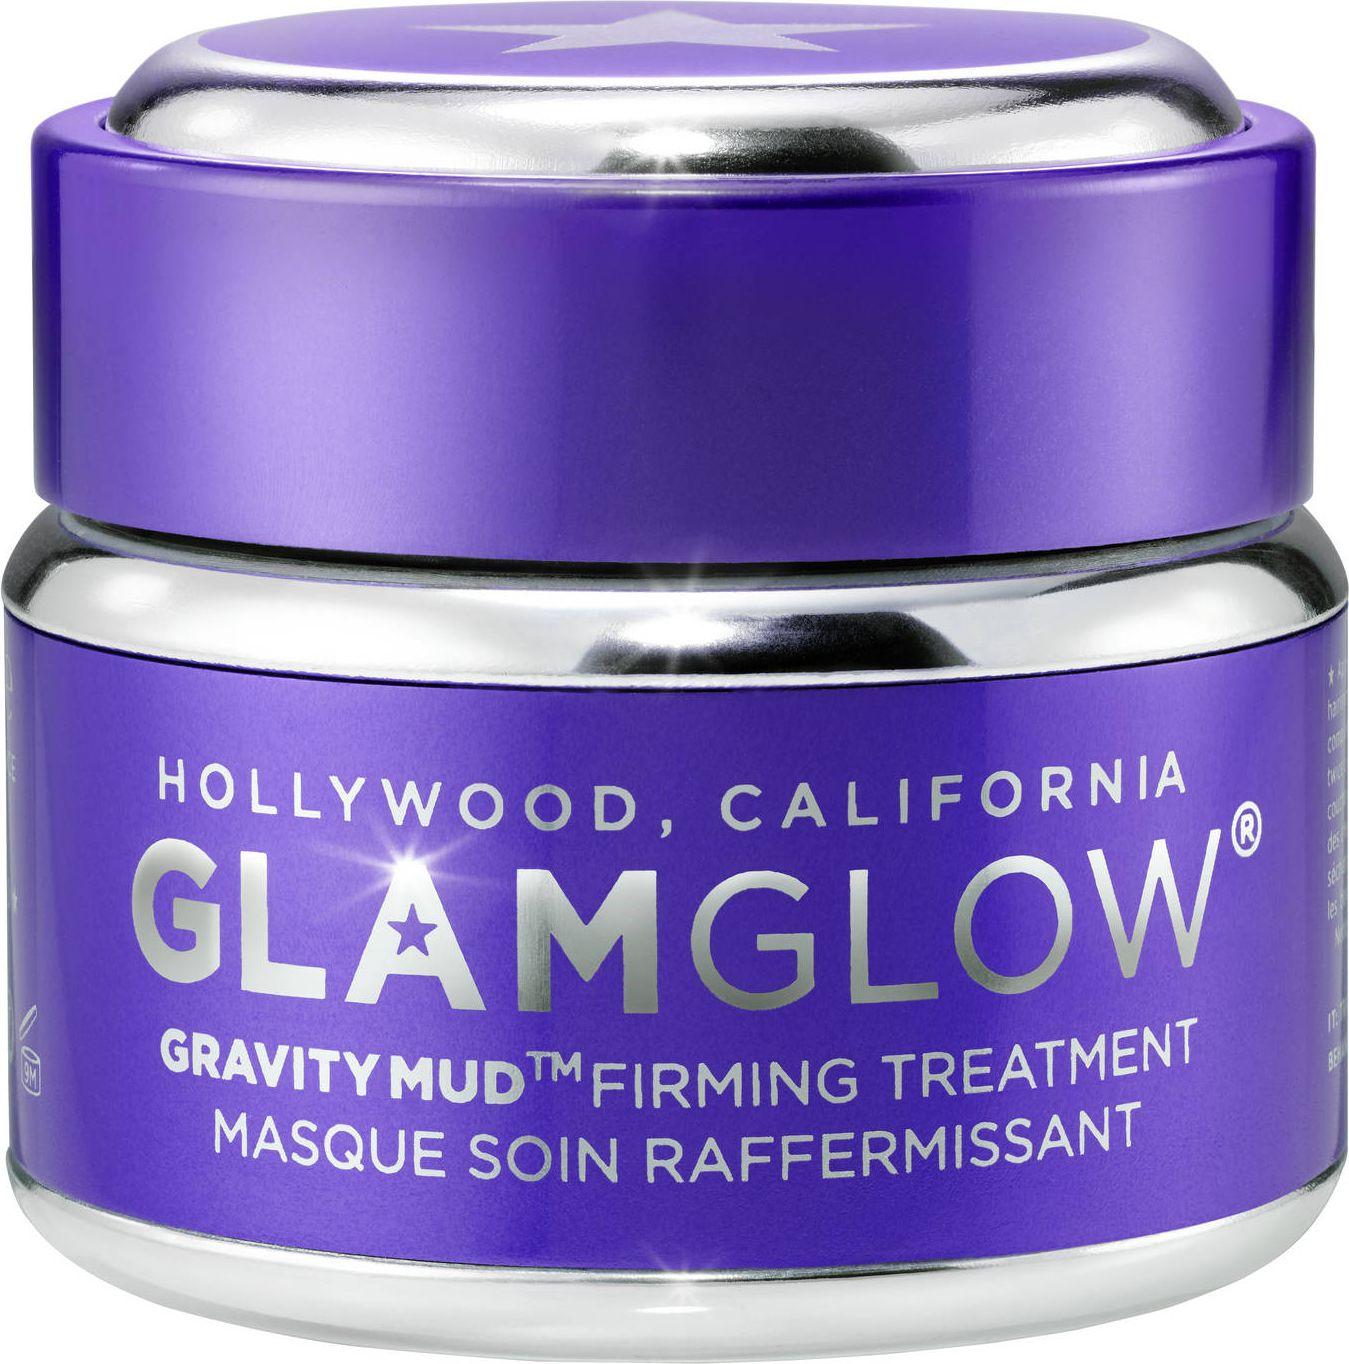 Glamglow Gravitymud Firming Treatment firming mask 15g